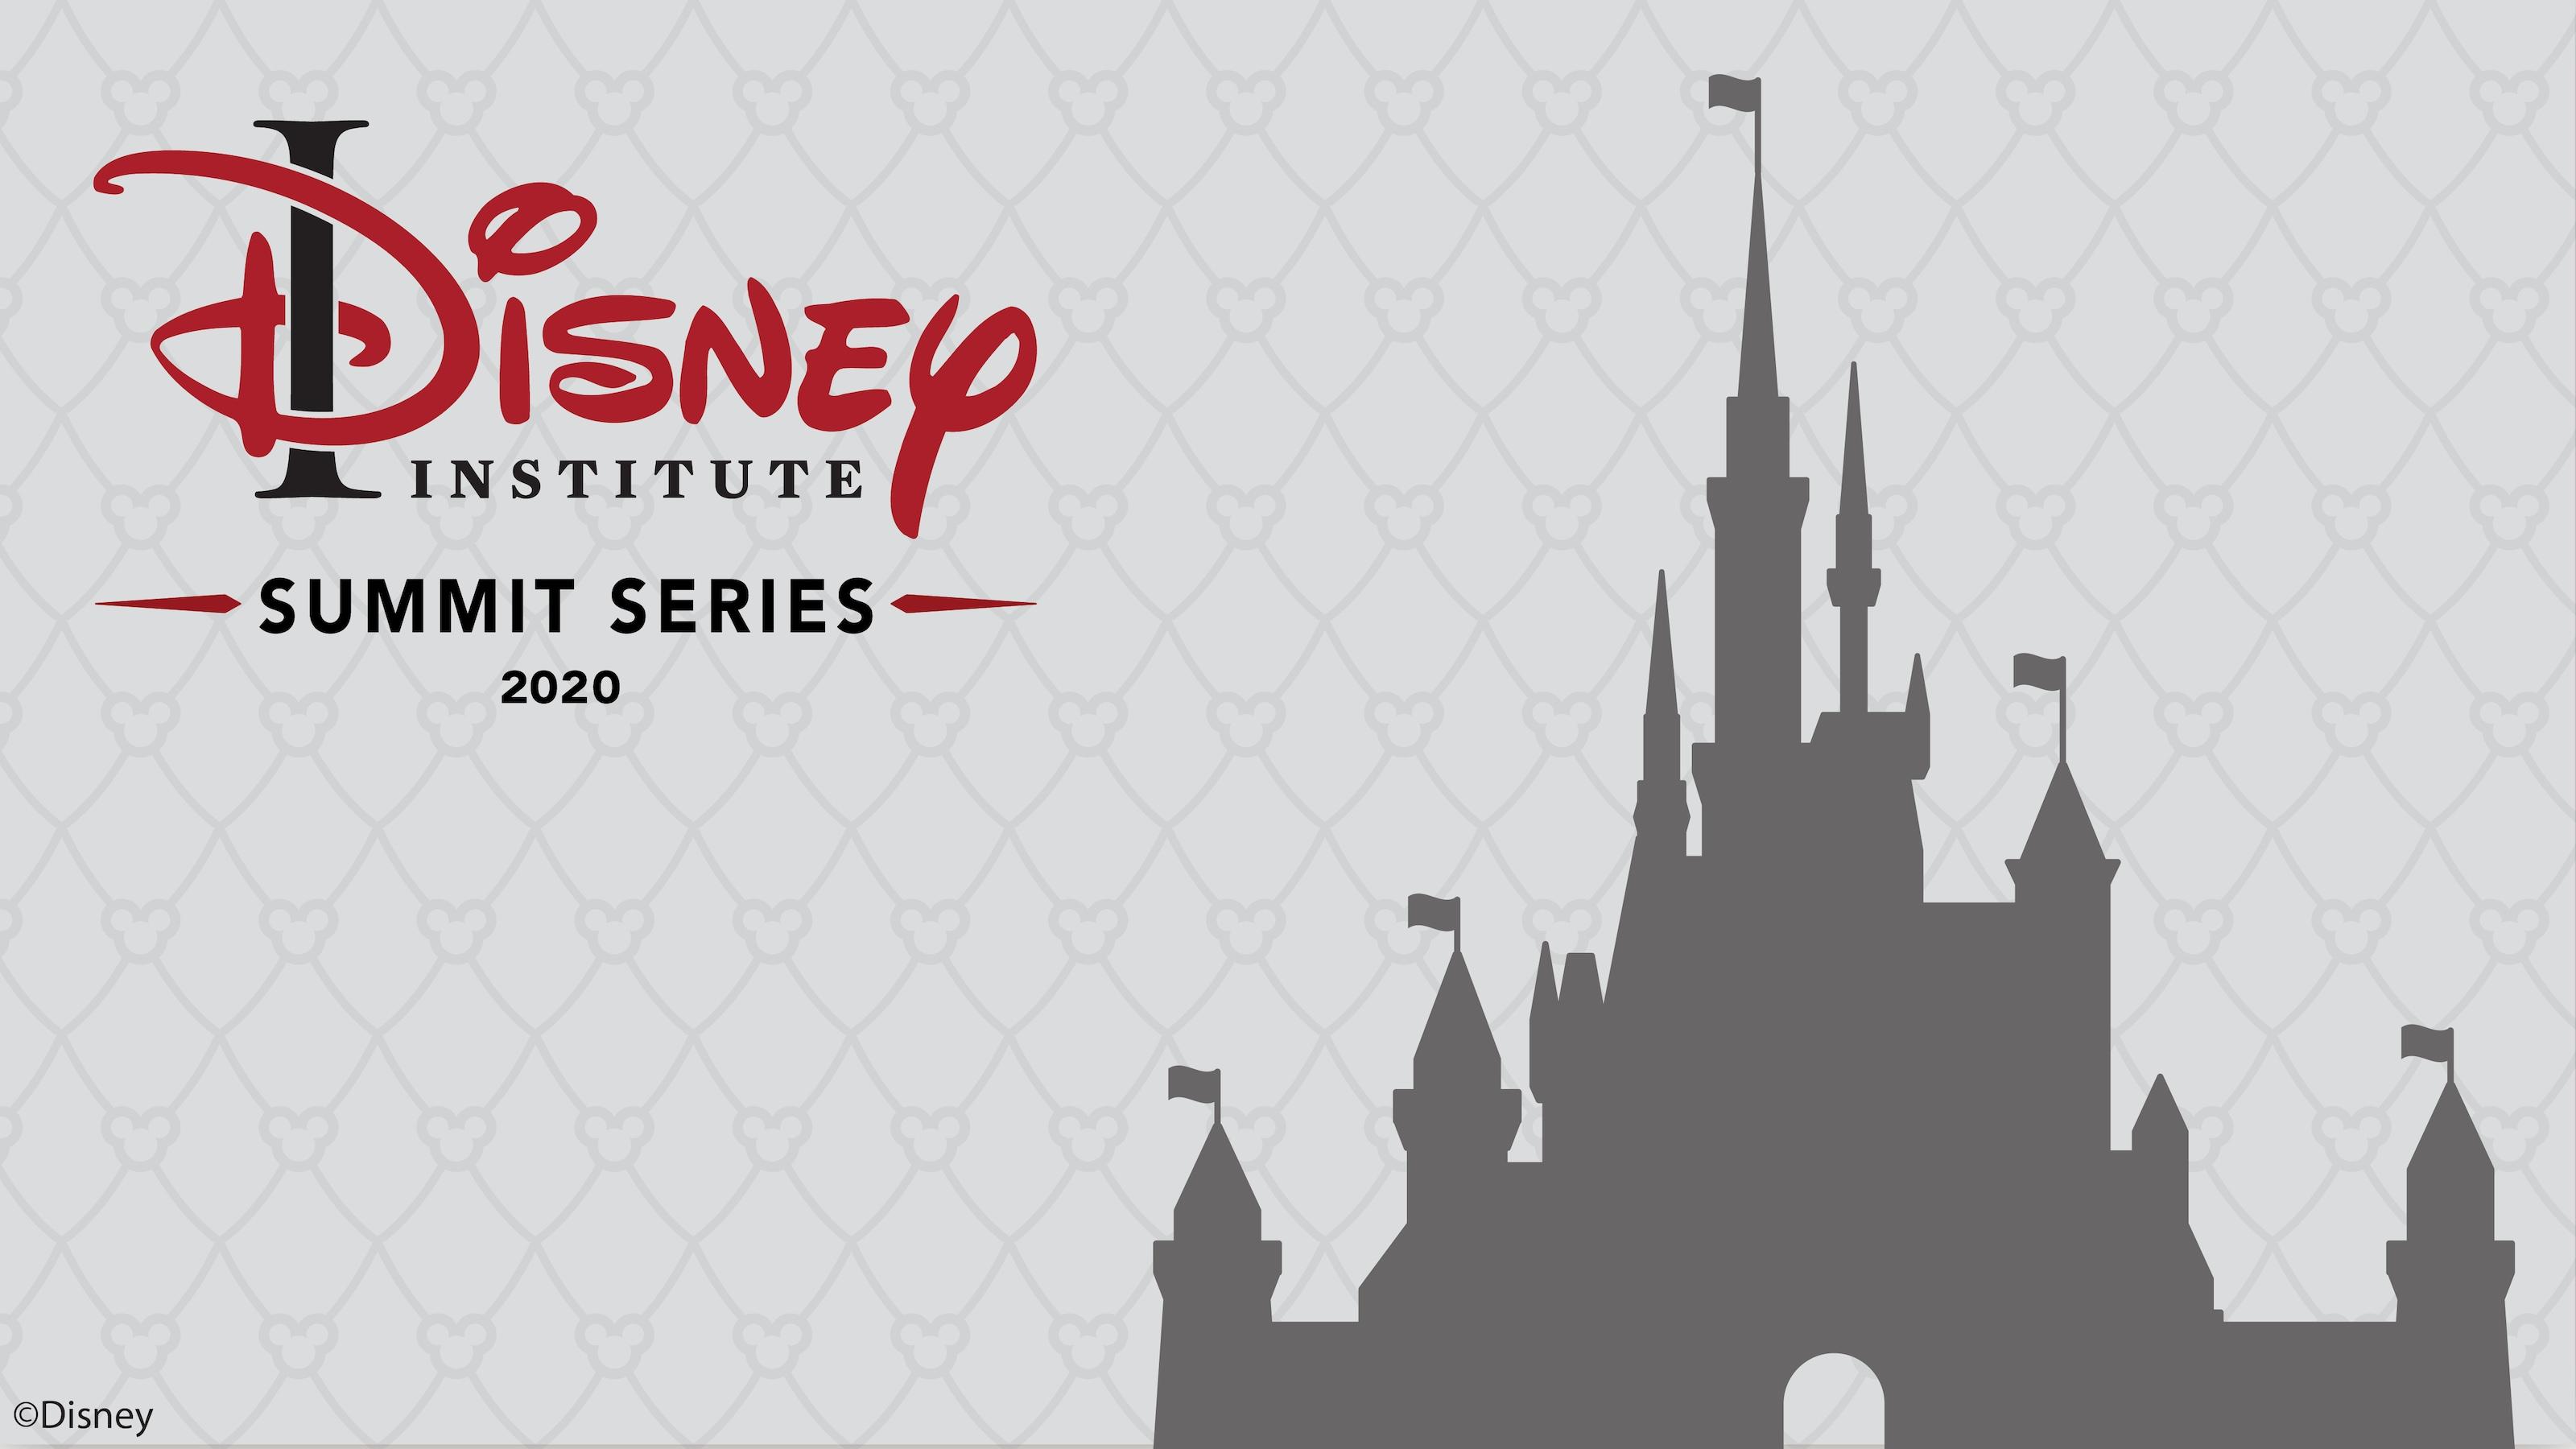 Registration Now Open For 2020 Disney Institute Summit Series